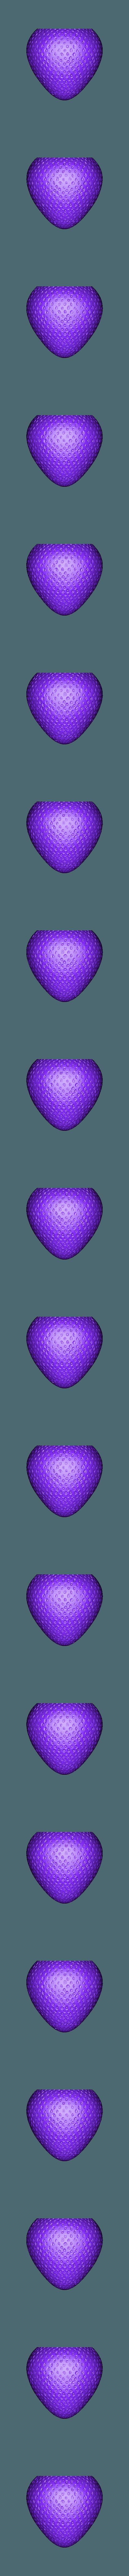 strawberry.stl Download free STL file Strawberry Hanging Planter • 3D printing design, Thatsick